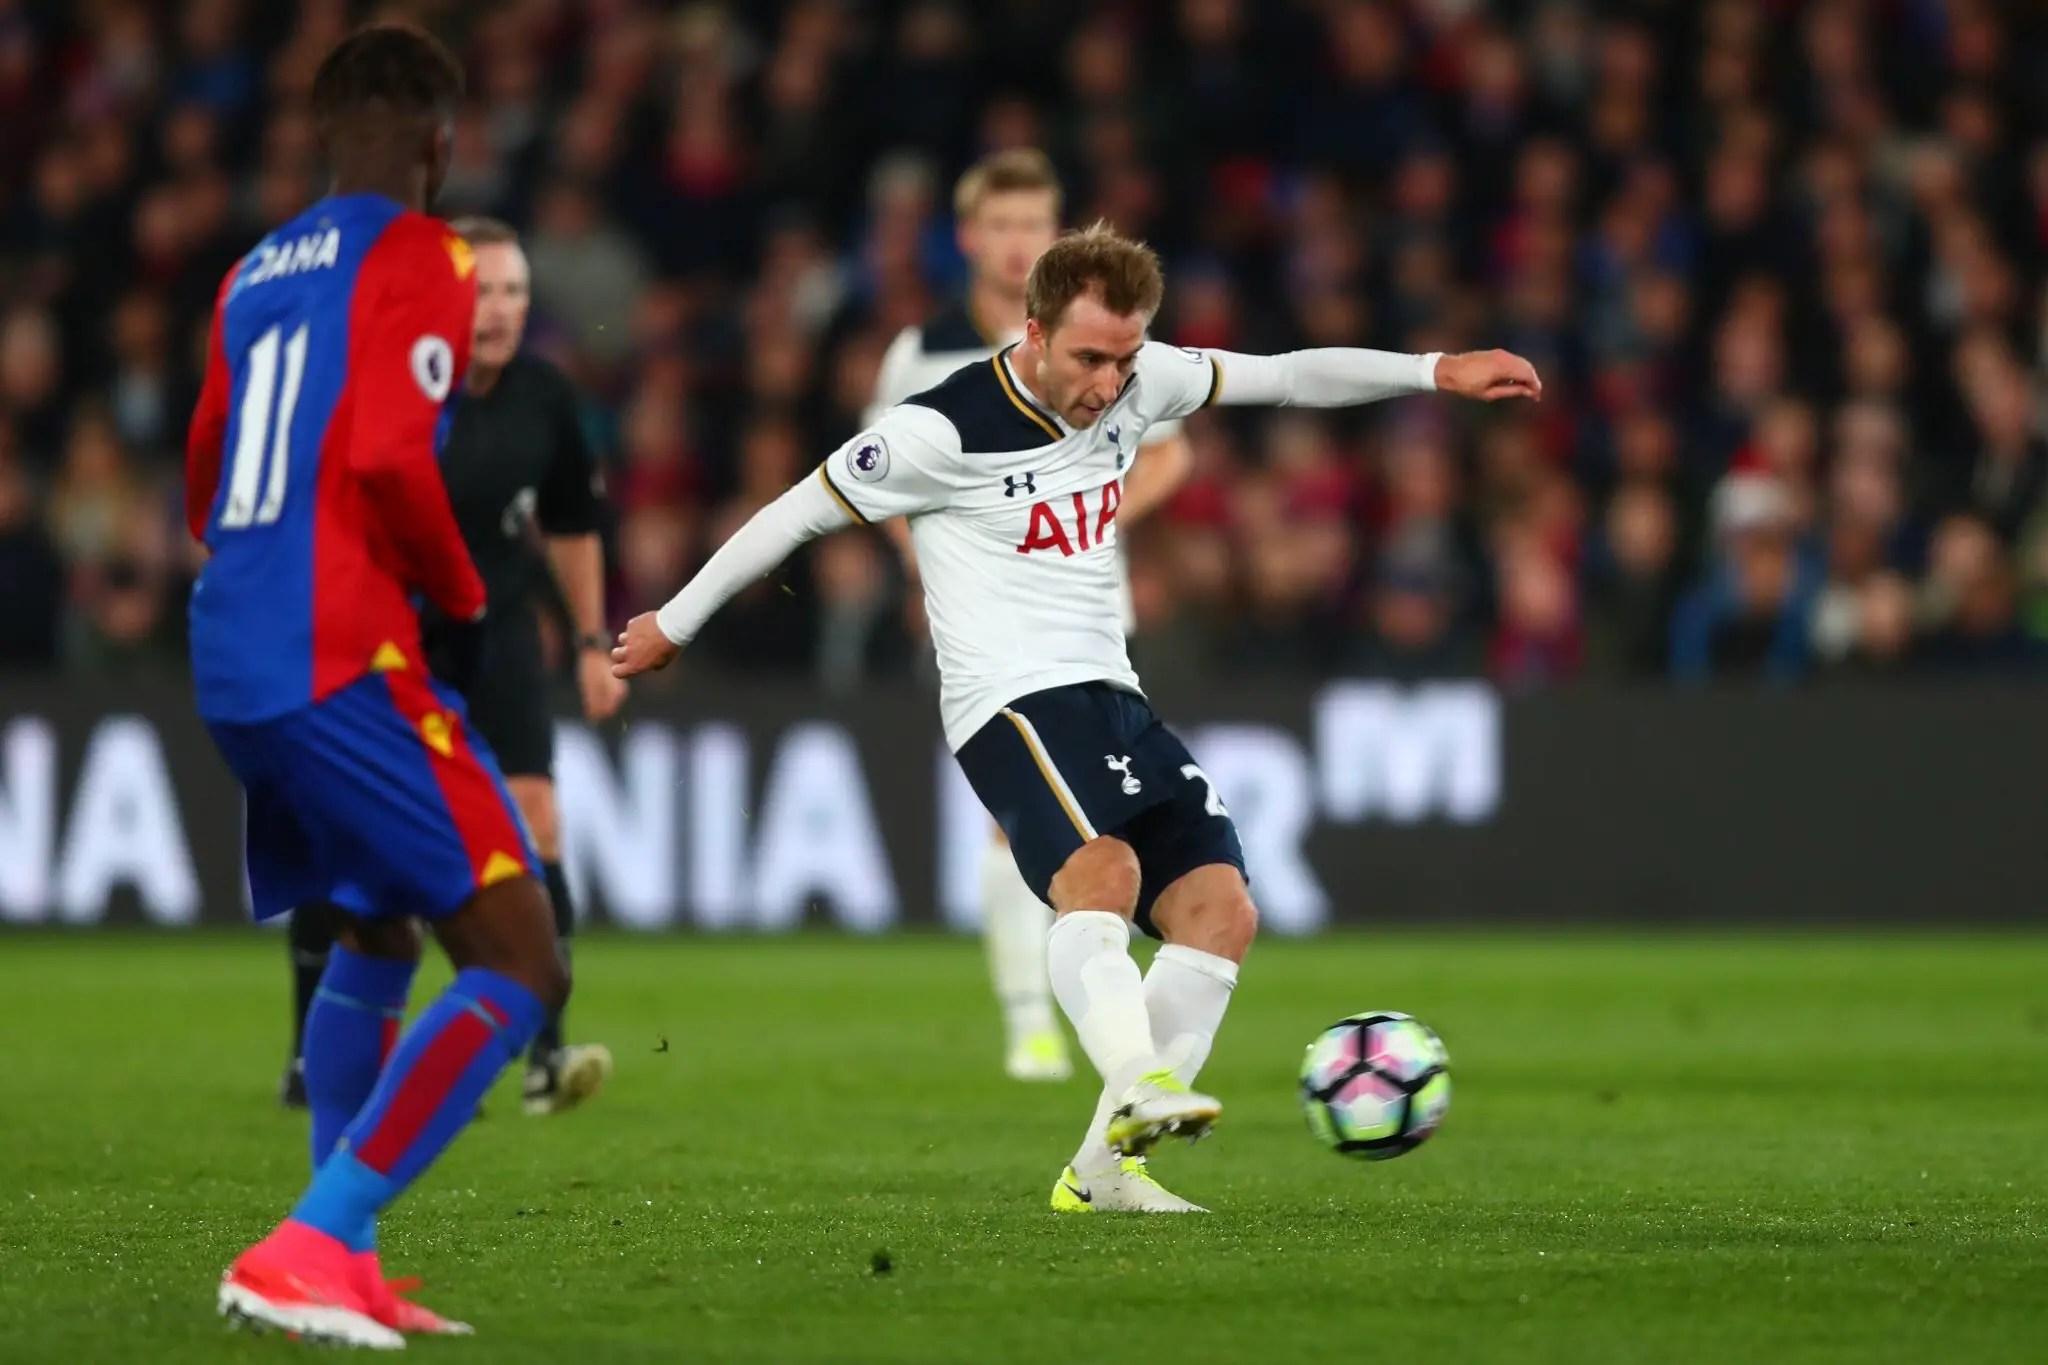 Eriksen's Goal Downs Palace, Keeps Tottenham In Premier League Title Race